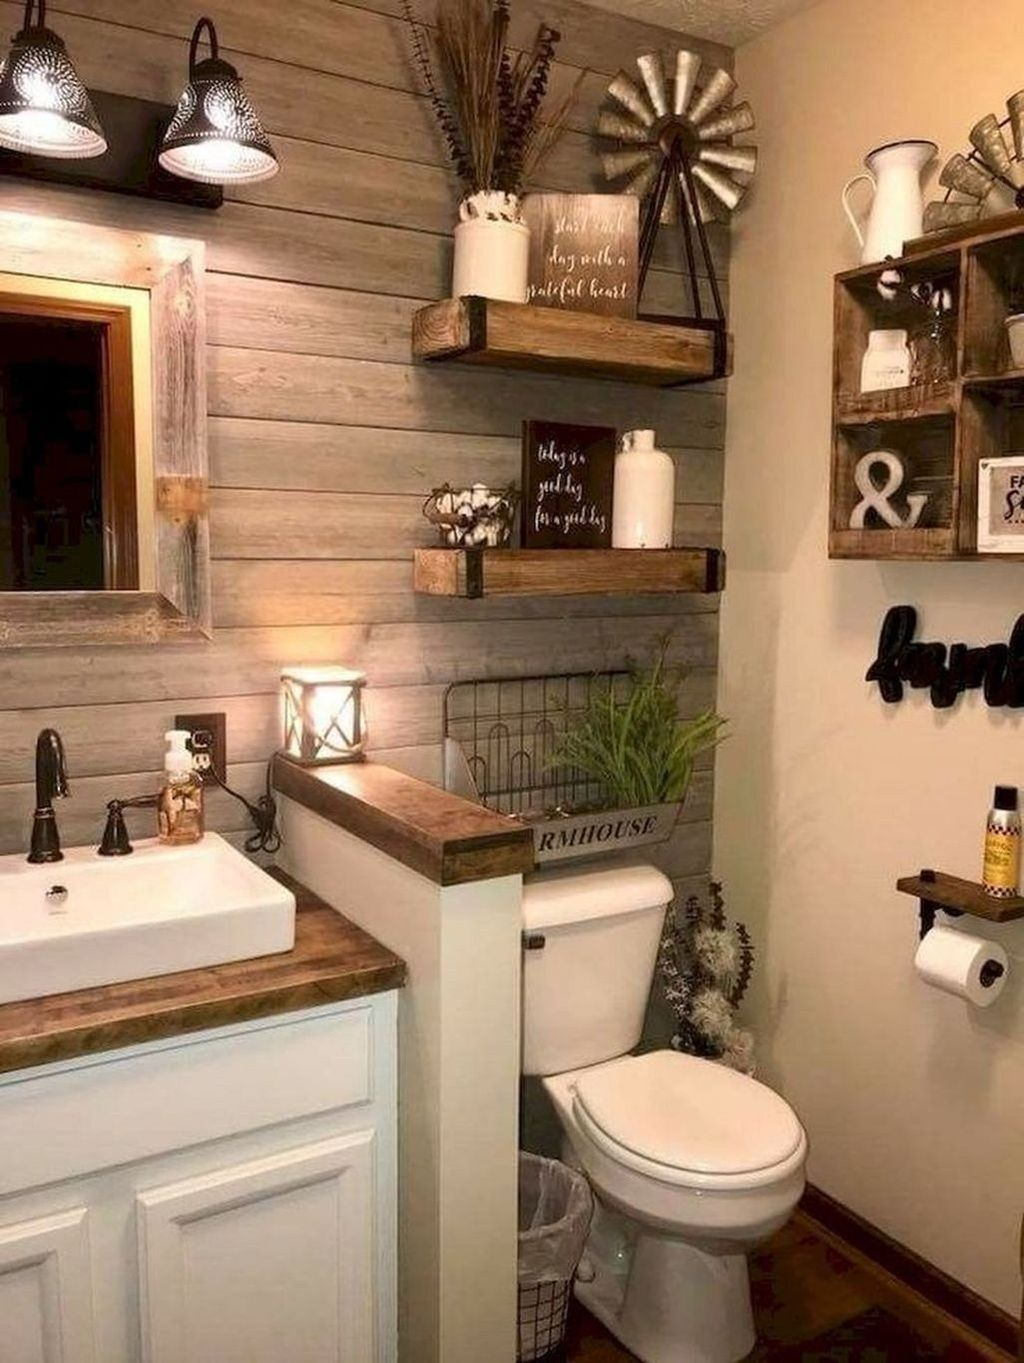 30 Cute Diy Bathroom Decor Ideas On A Budget Bathroom Decor Best Bathroom Designs Rustic Bathrooms